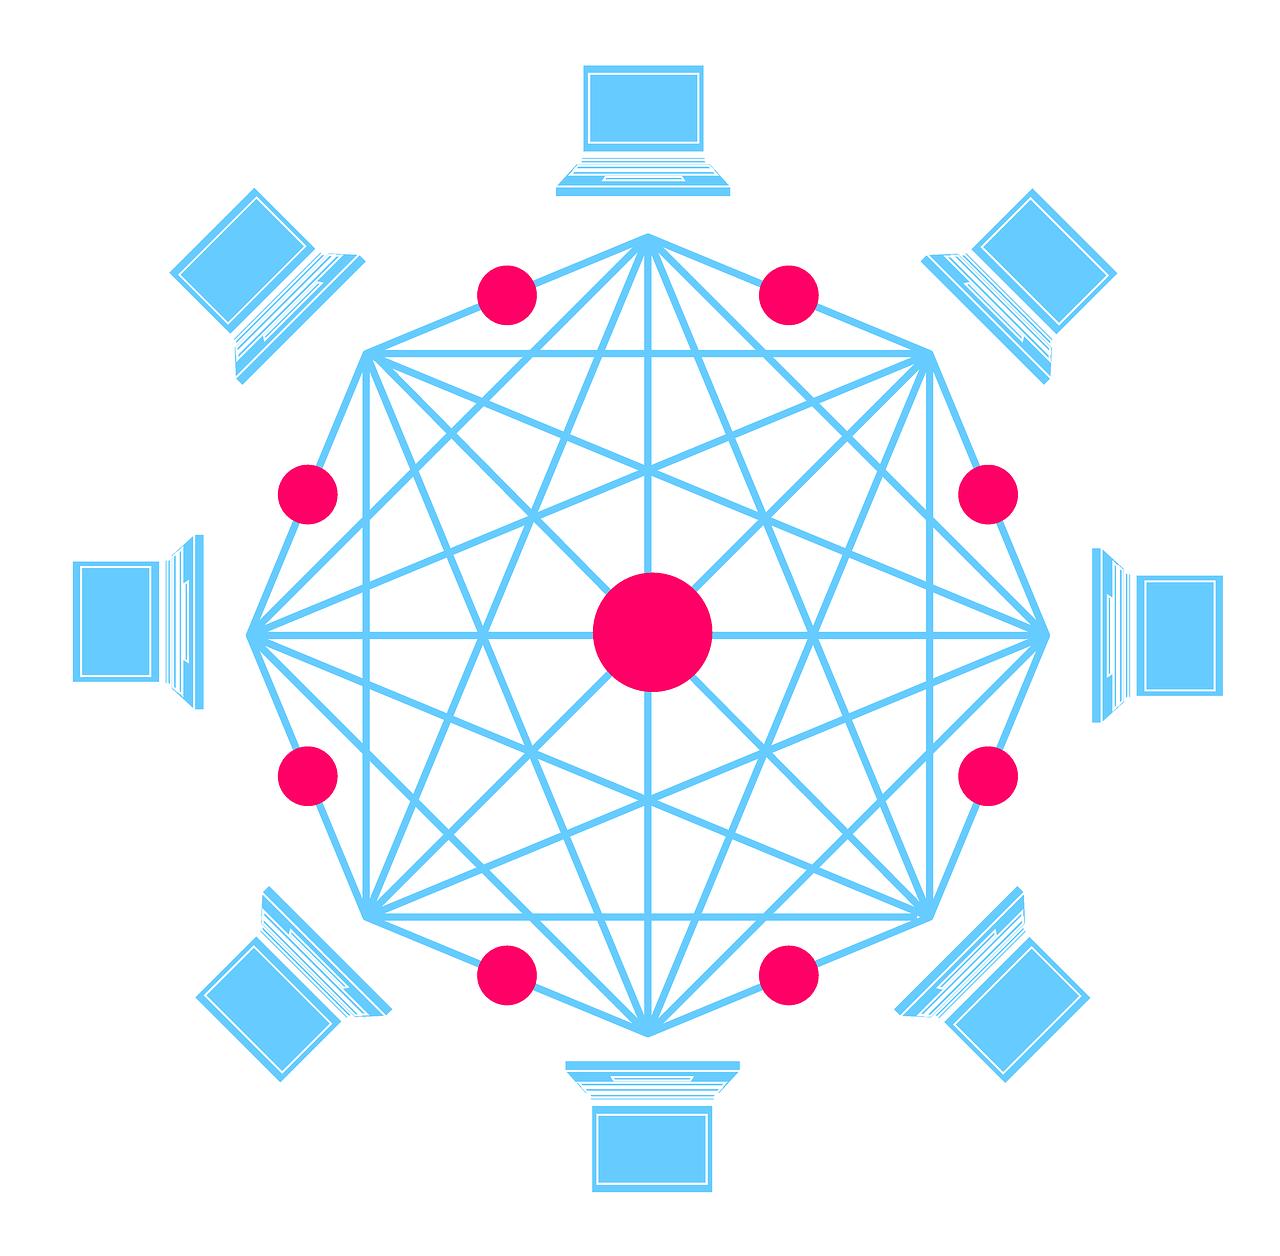 de-decentralization